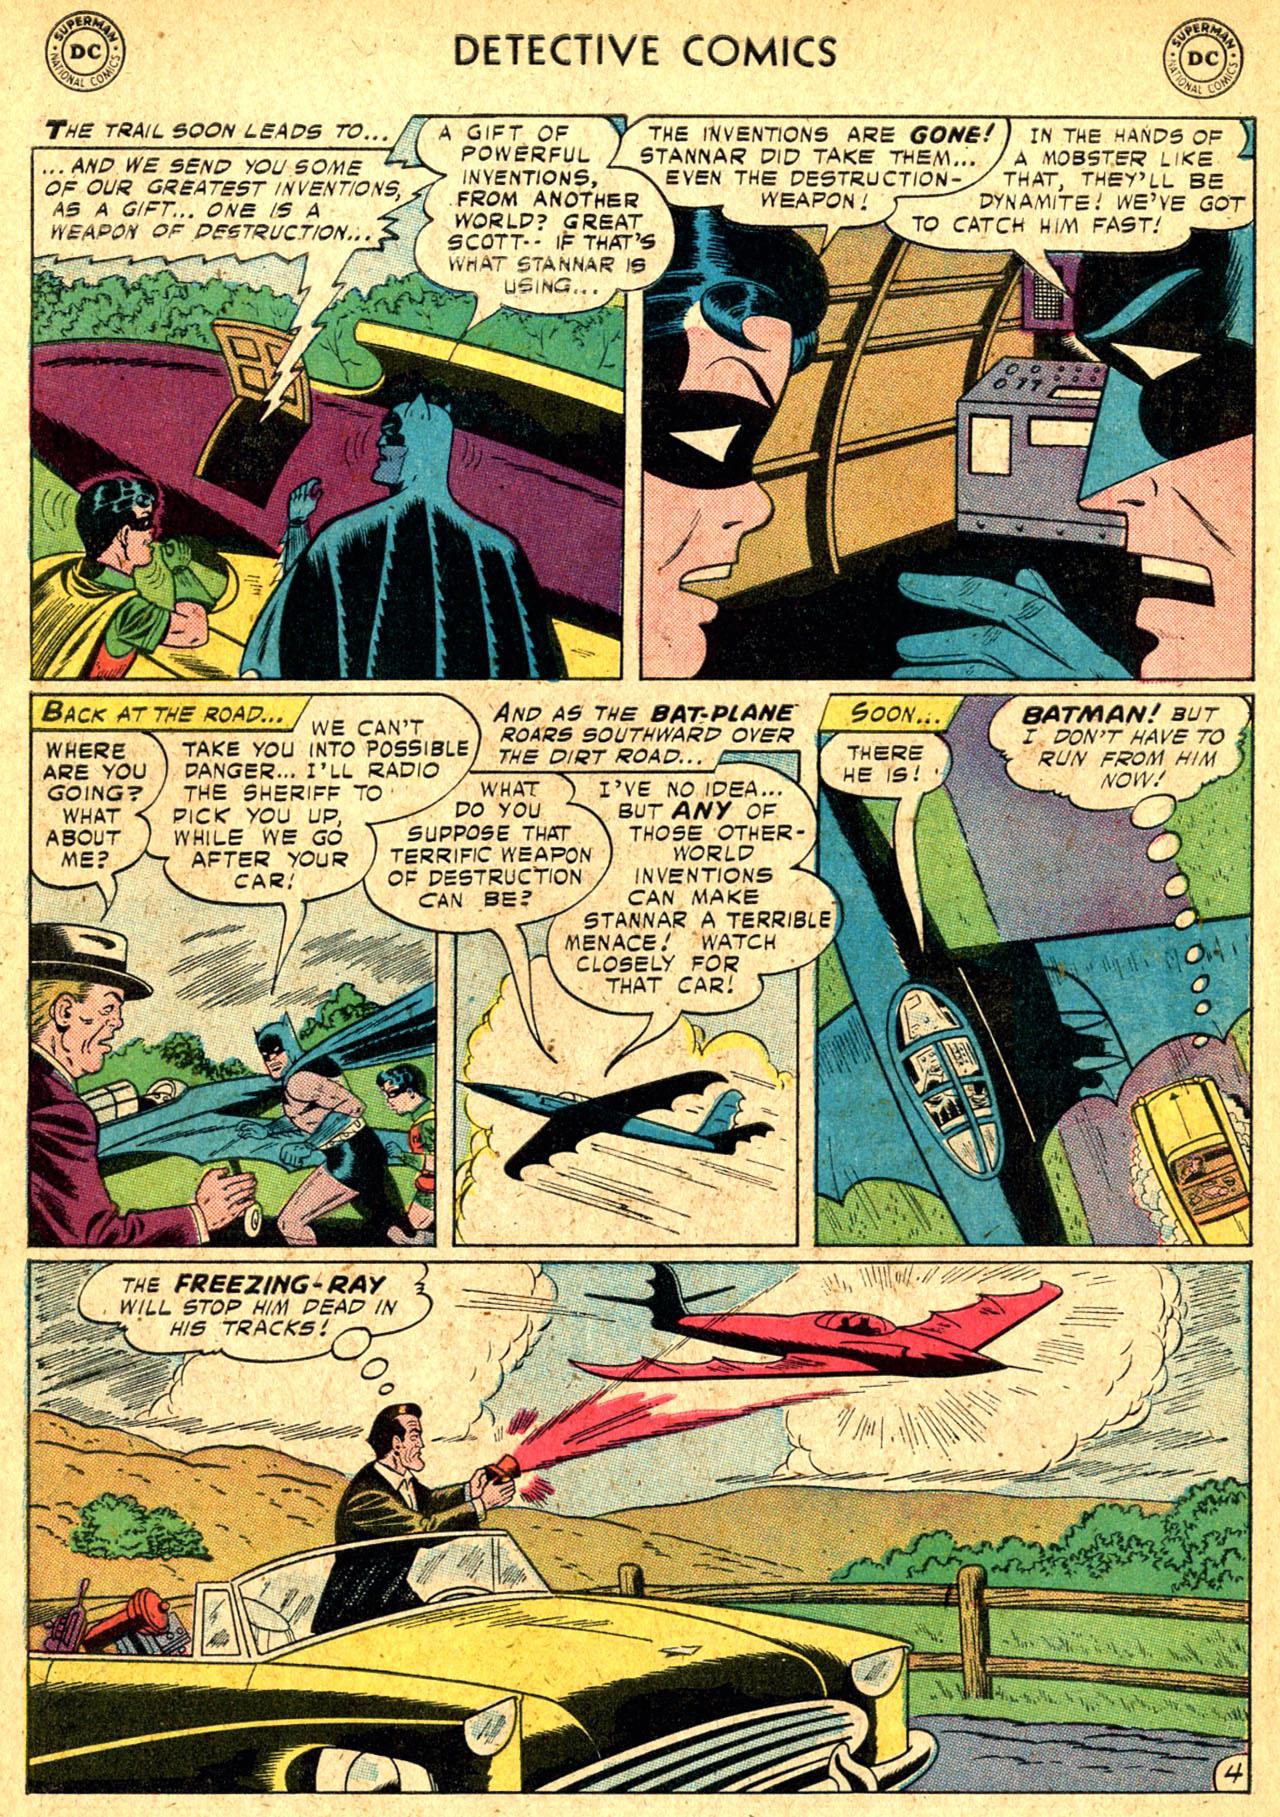 Read online Detective Comics (1937) comic -  Issue #250 - 6